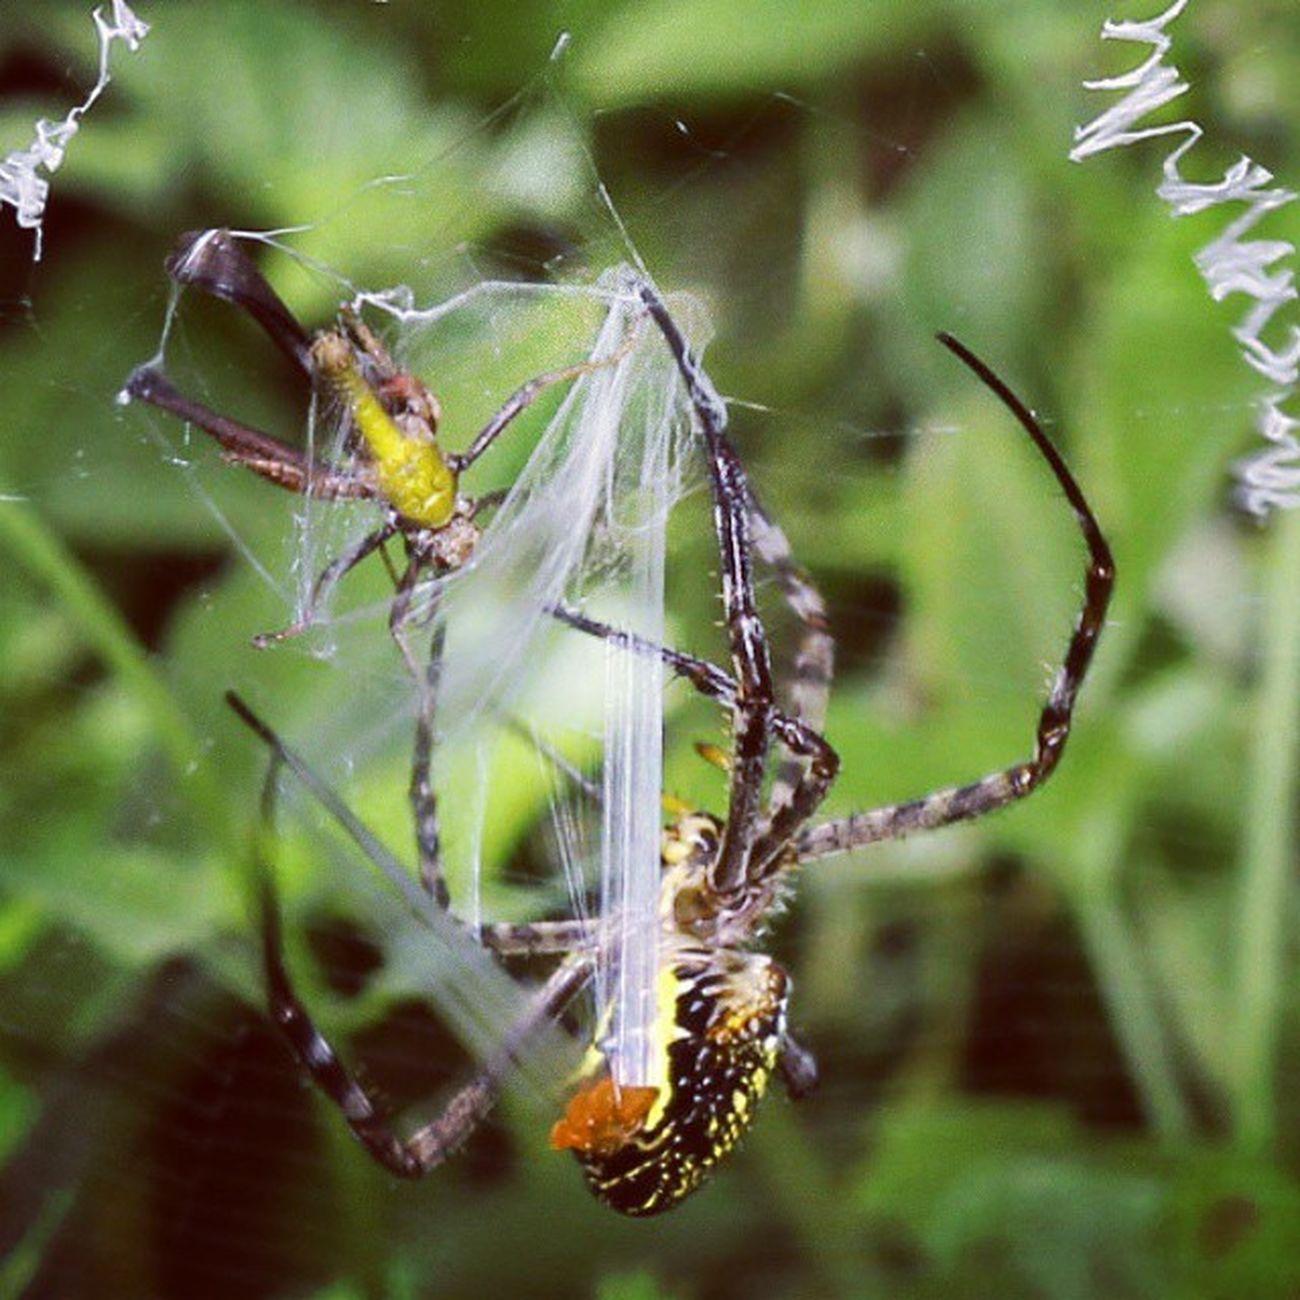 Balut mangsa. Spider Spiderworld Ig_spider Macro macroworld_tr tgif_insects igglobalclubmacro greatshoot